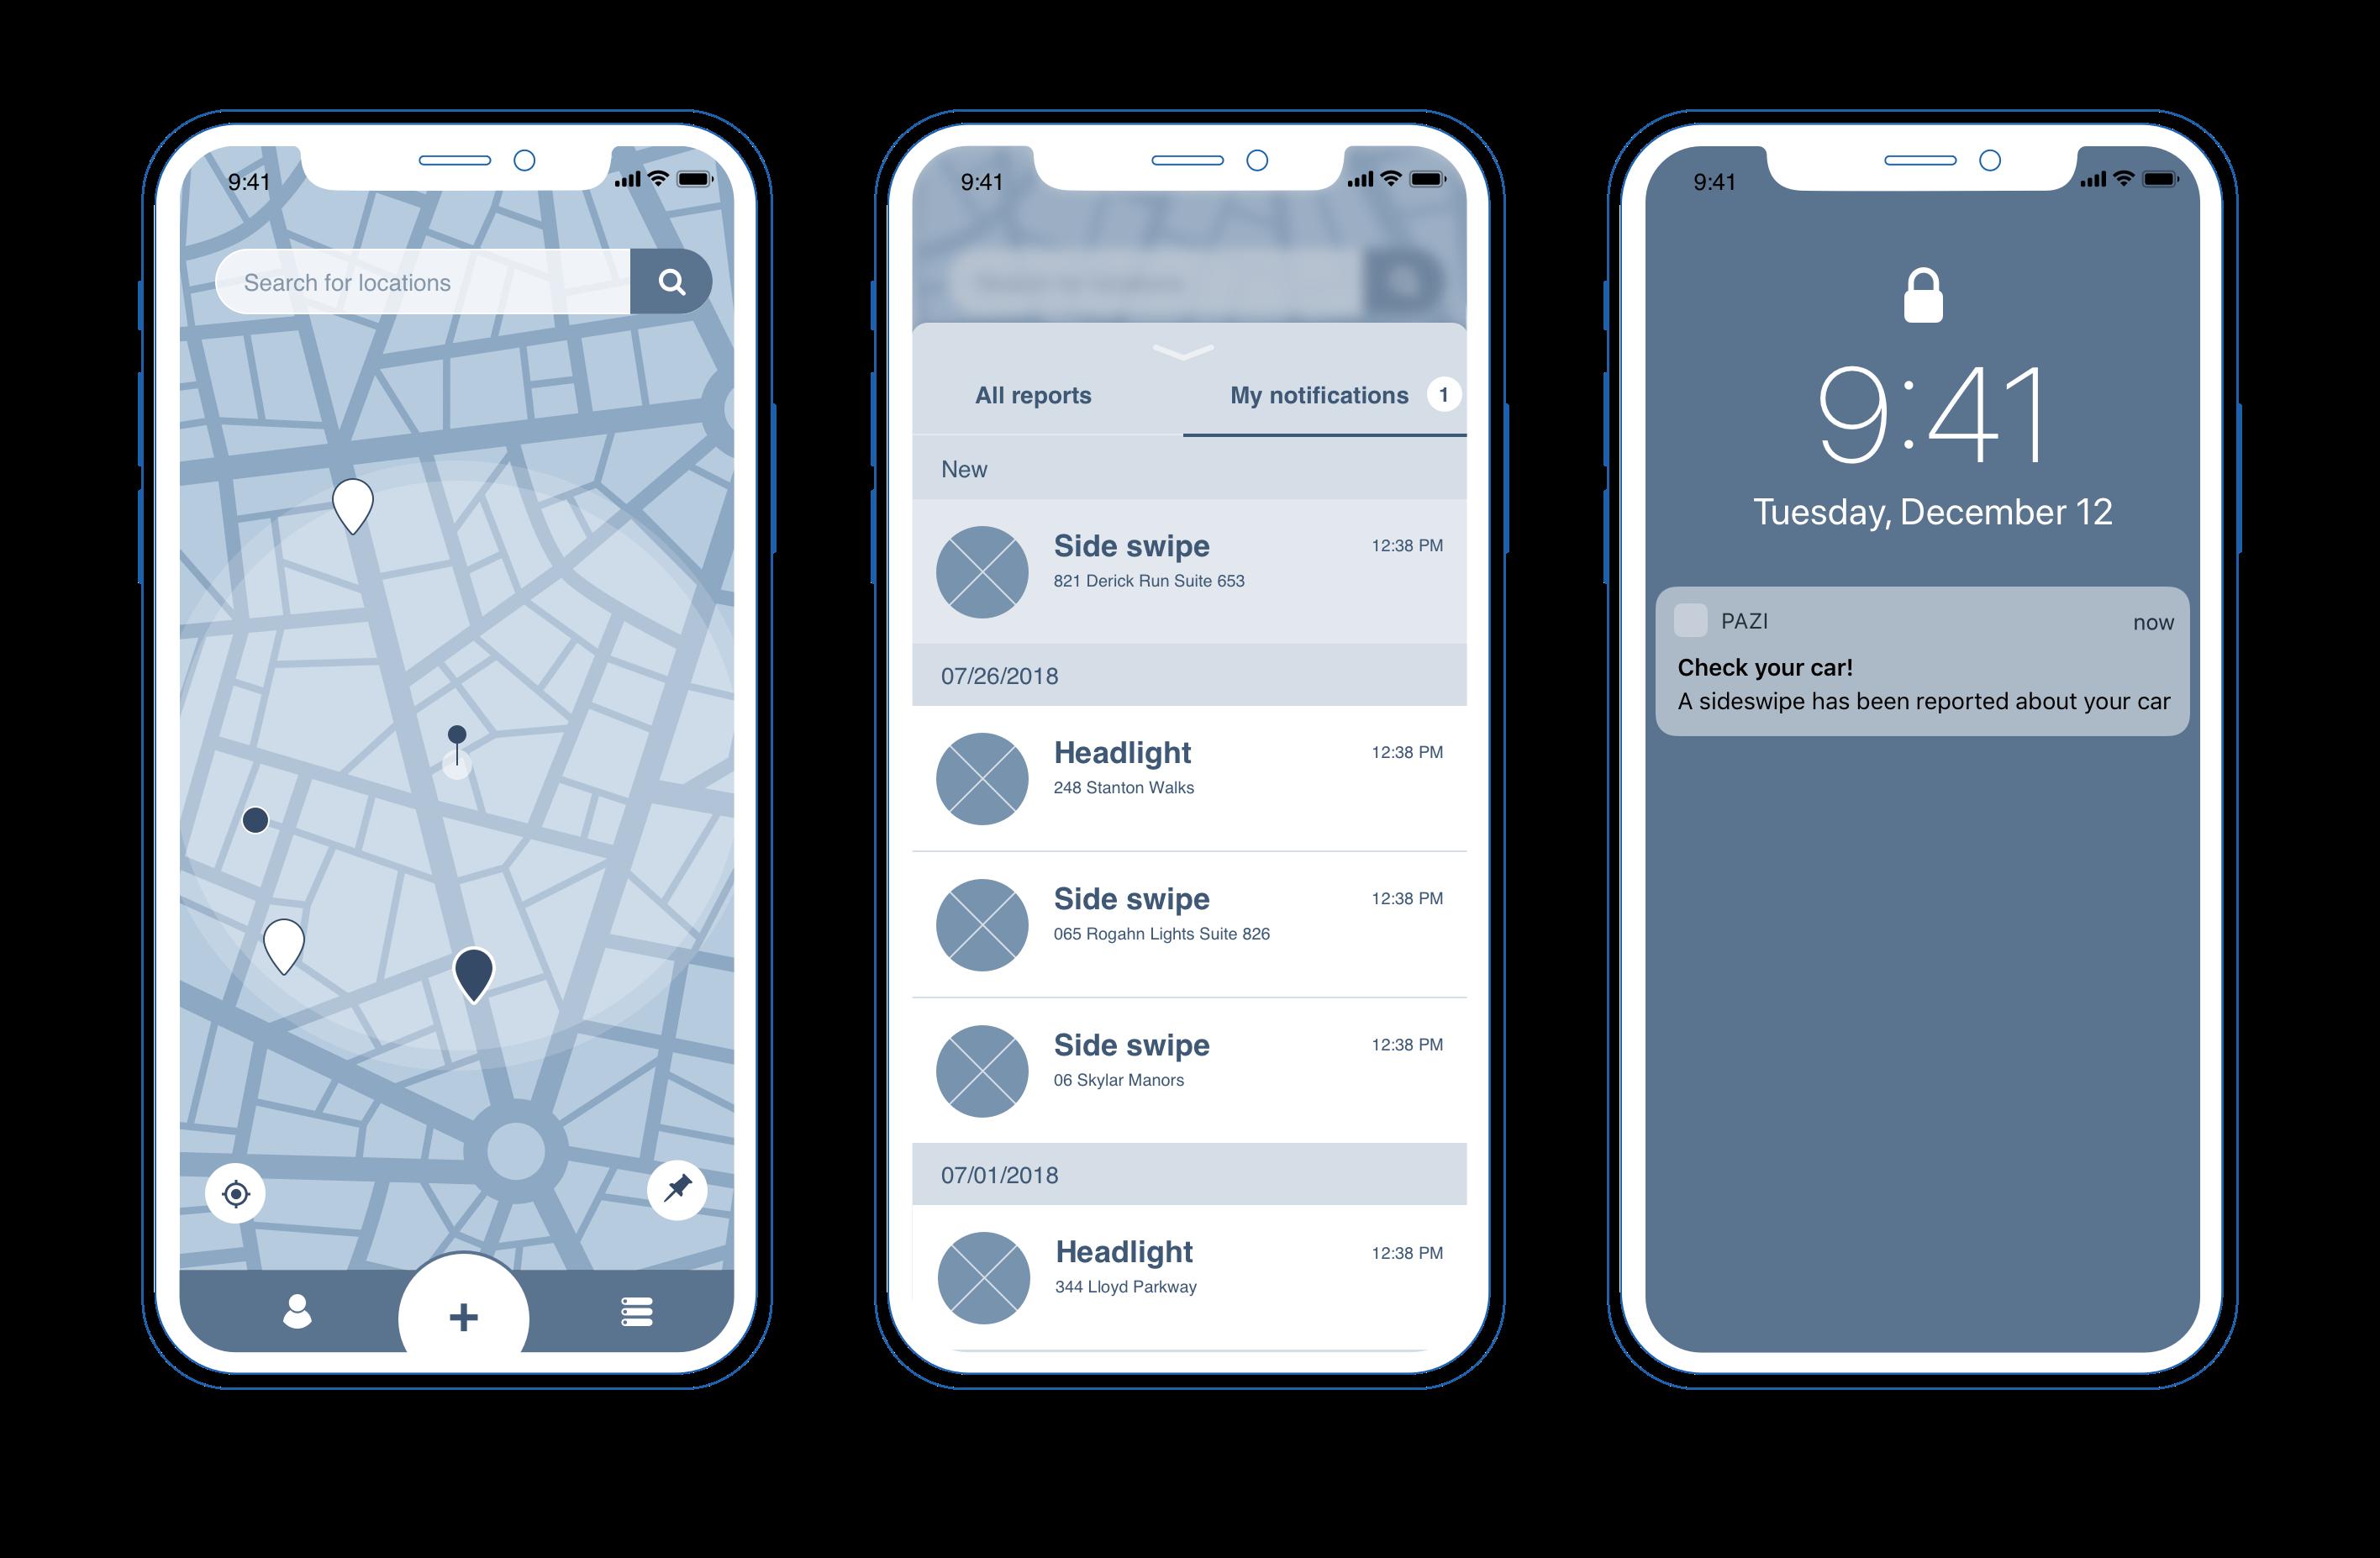 UX design pazi mobile app